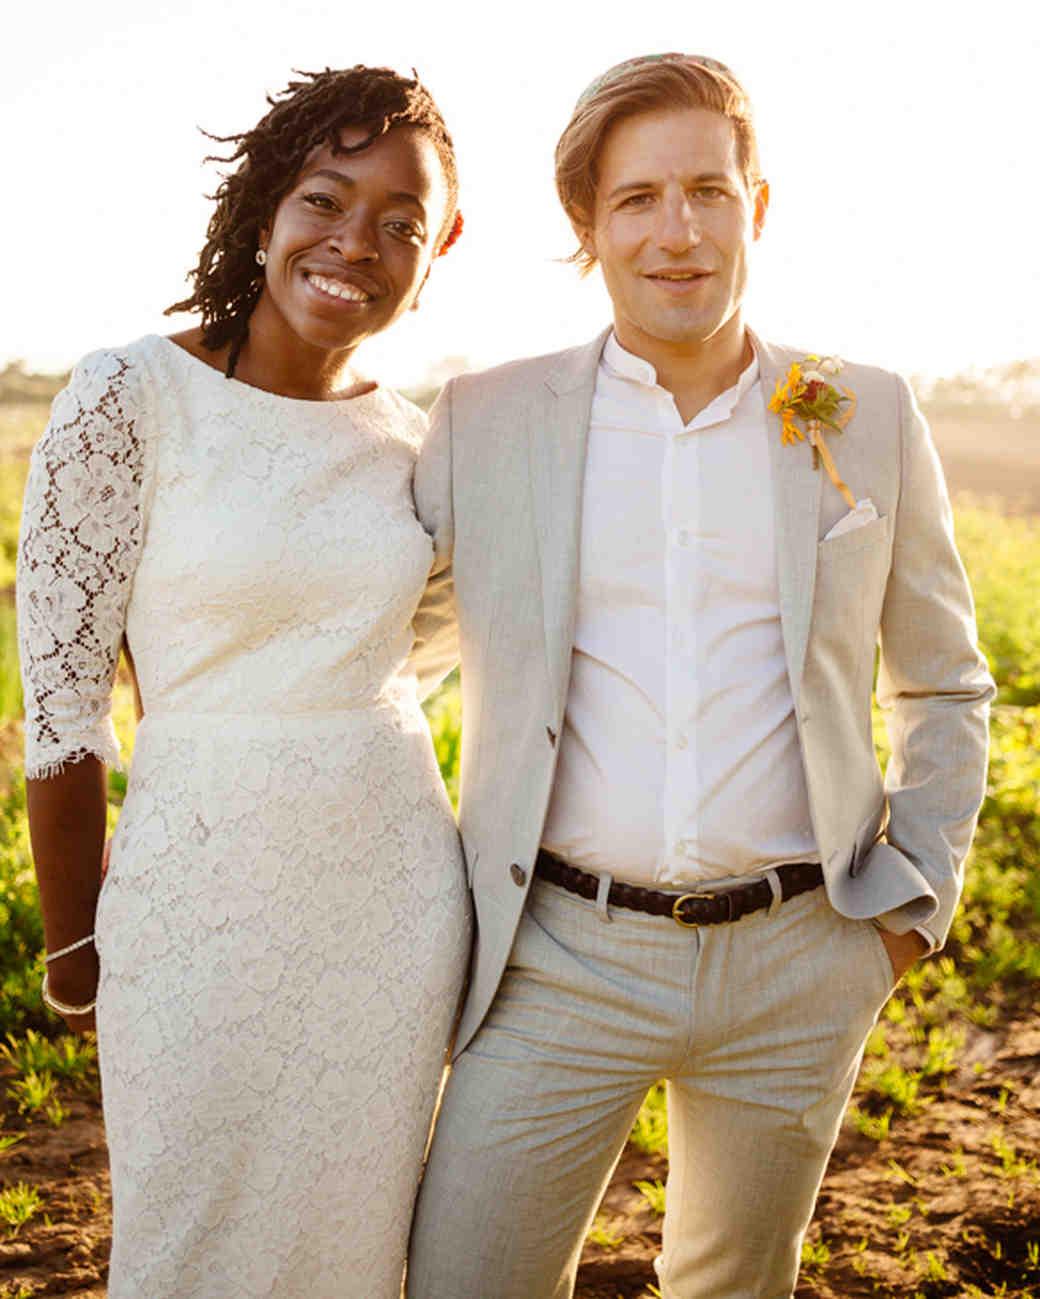 erica-jordy-wedding-couple-4281-s111971-0715.jpg